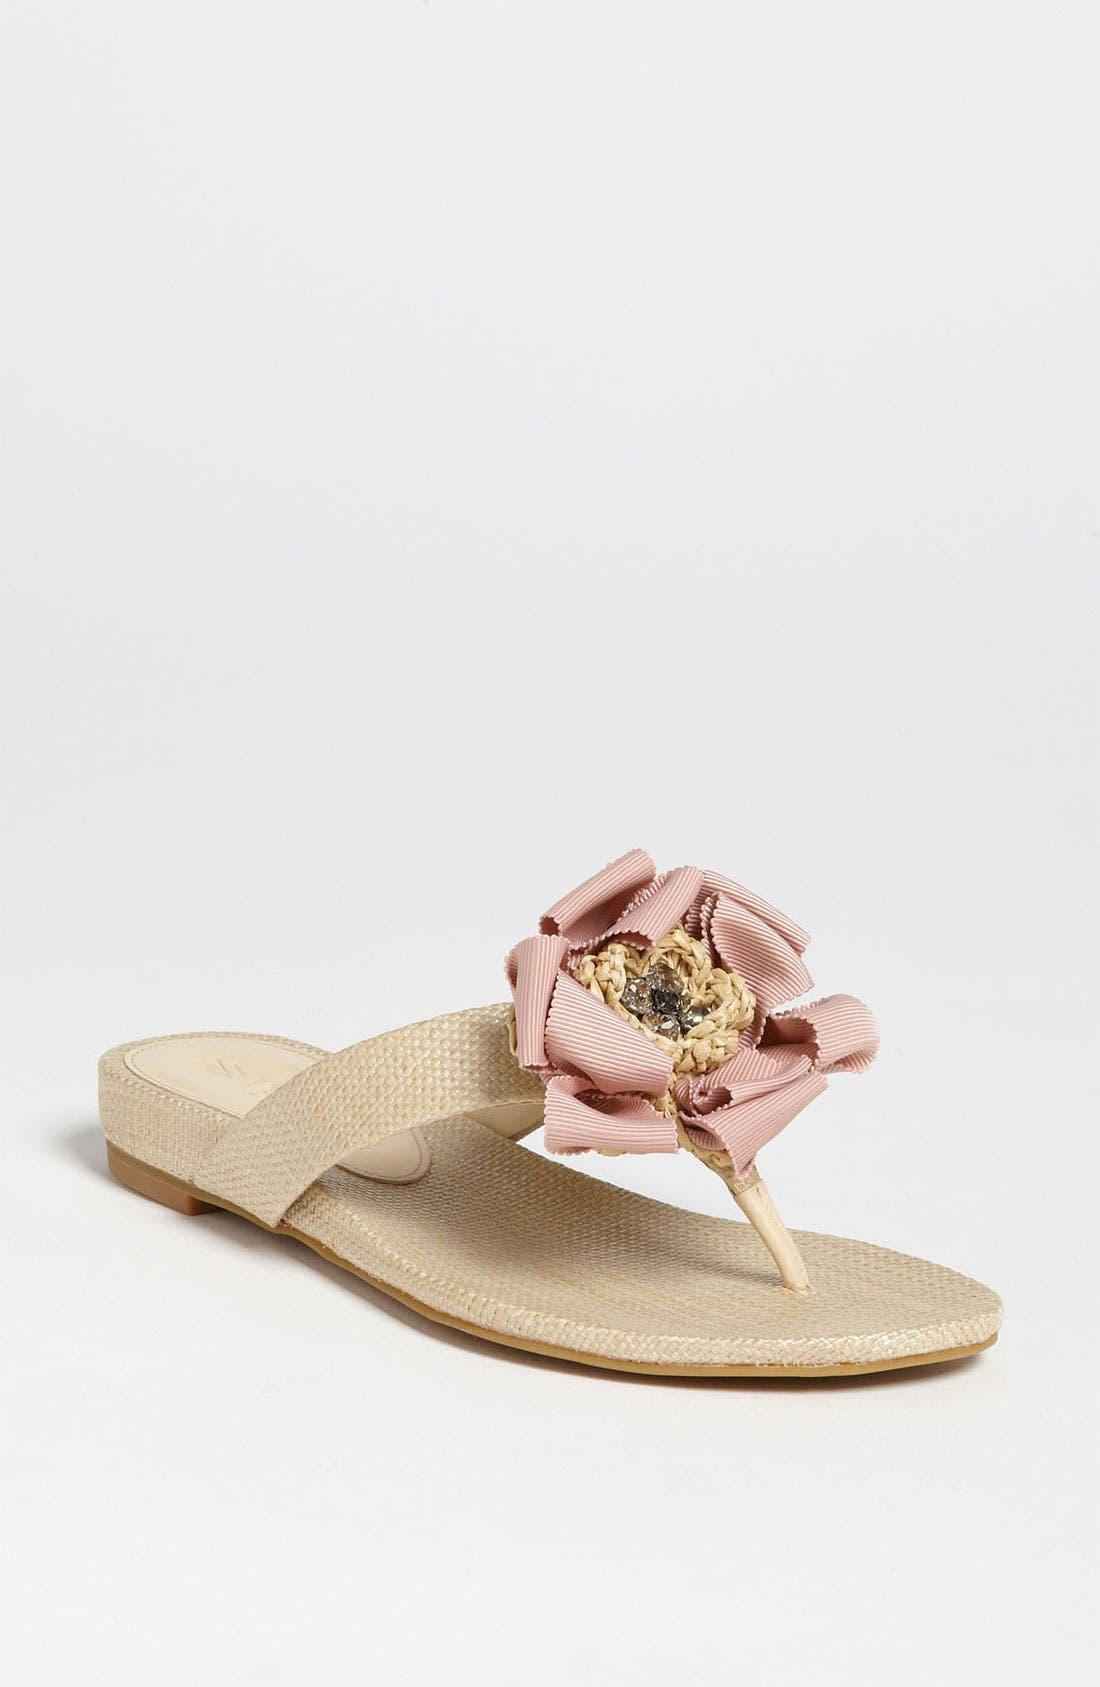 Main Image - Vera Wang Footwear 'Blaine' Skimmer